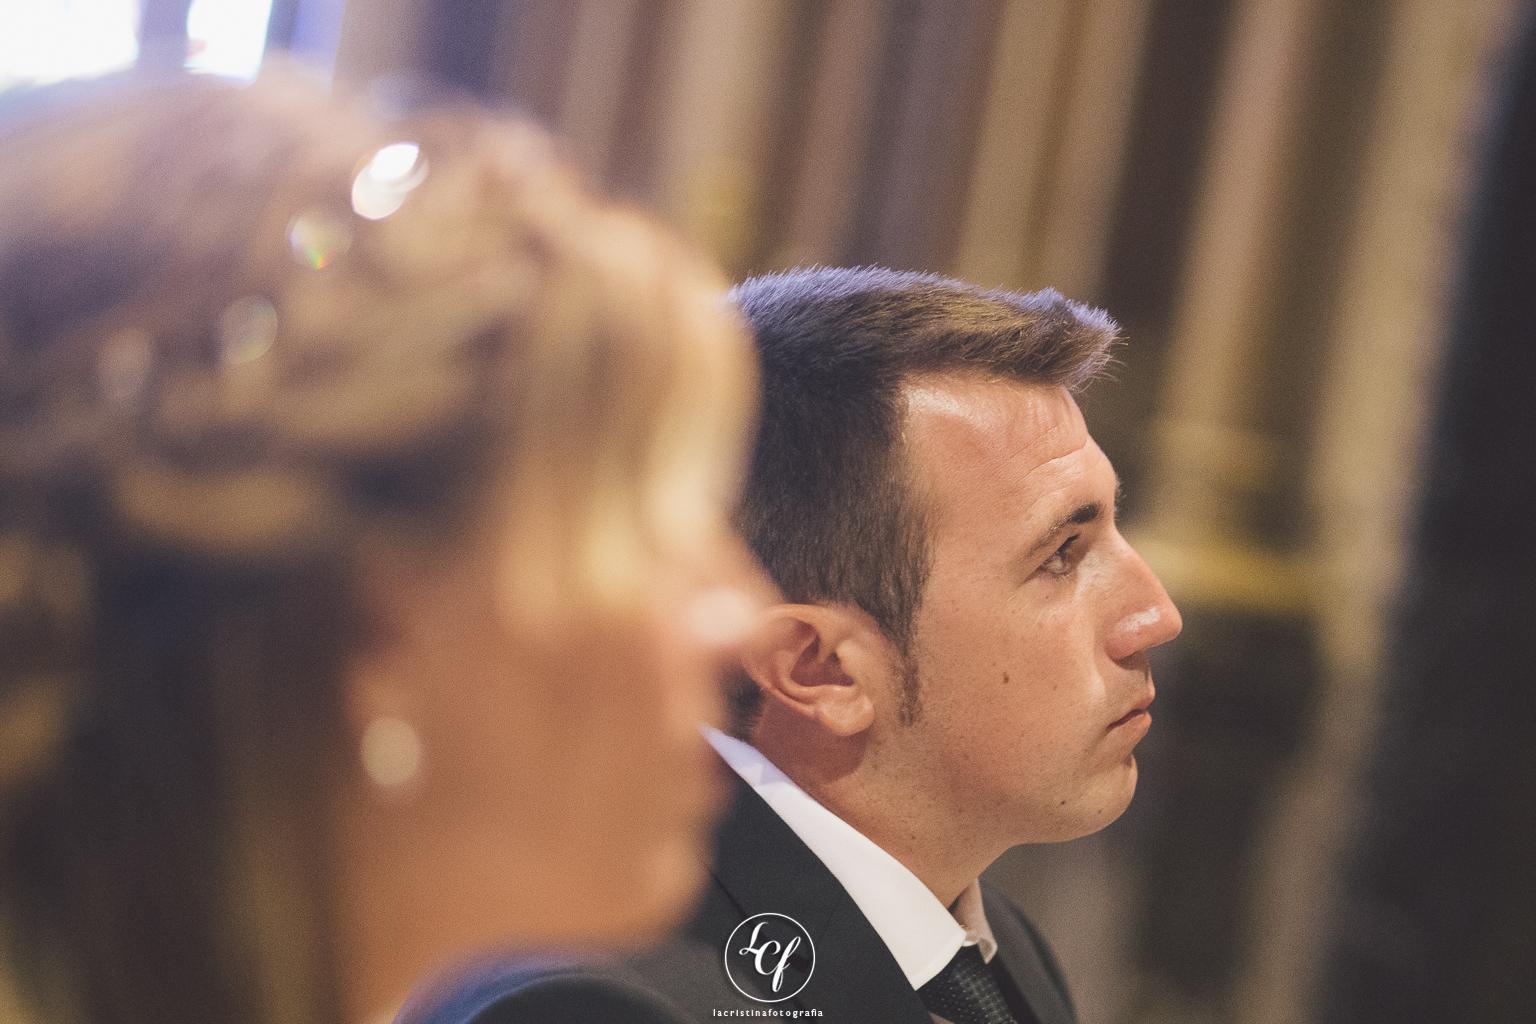 Fotografo de boda Montserrat :: Fotografía de boda :: Destination Wedding :: Fotógrafa de bodas